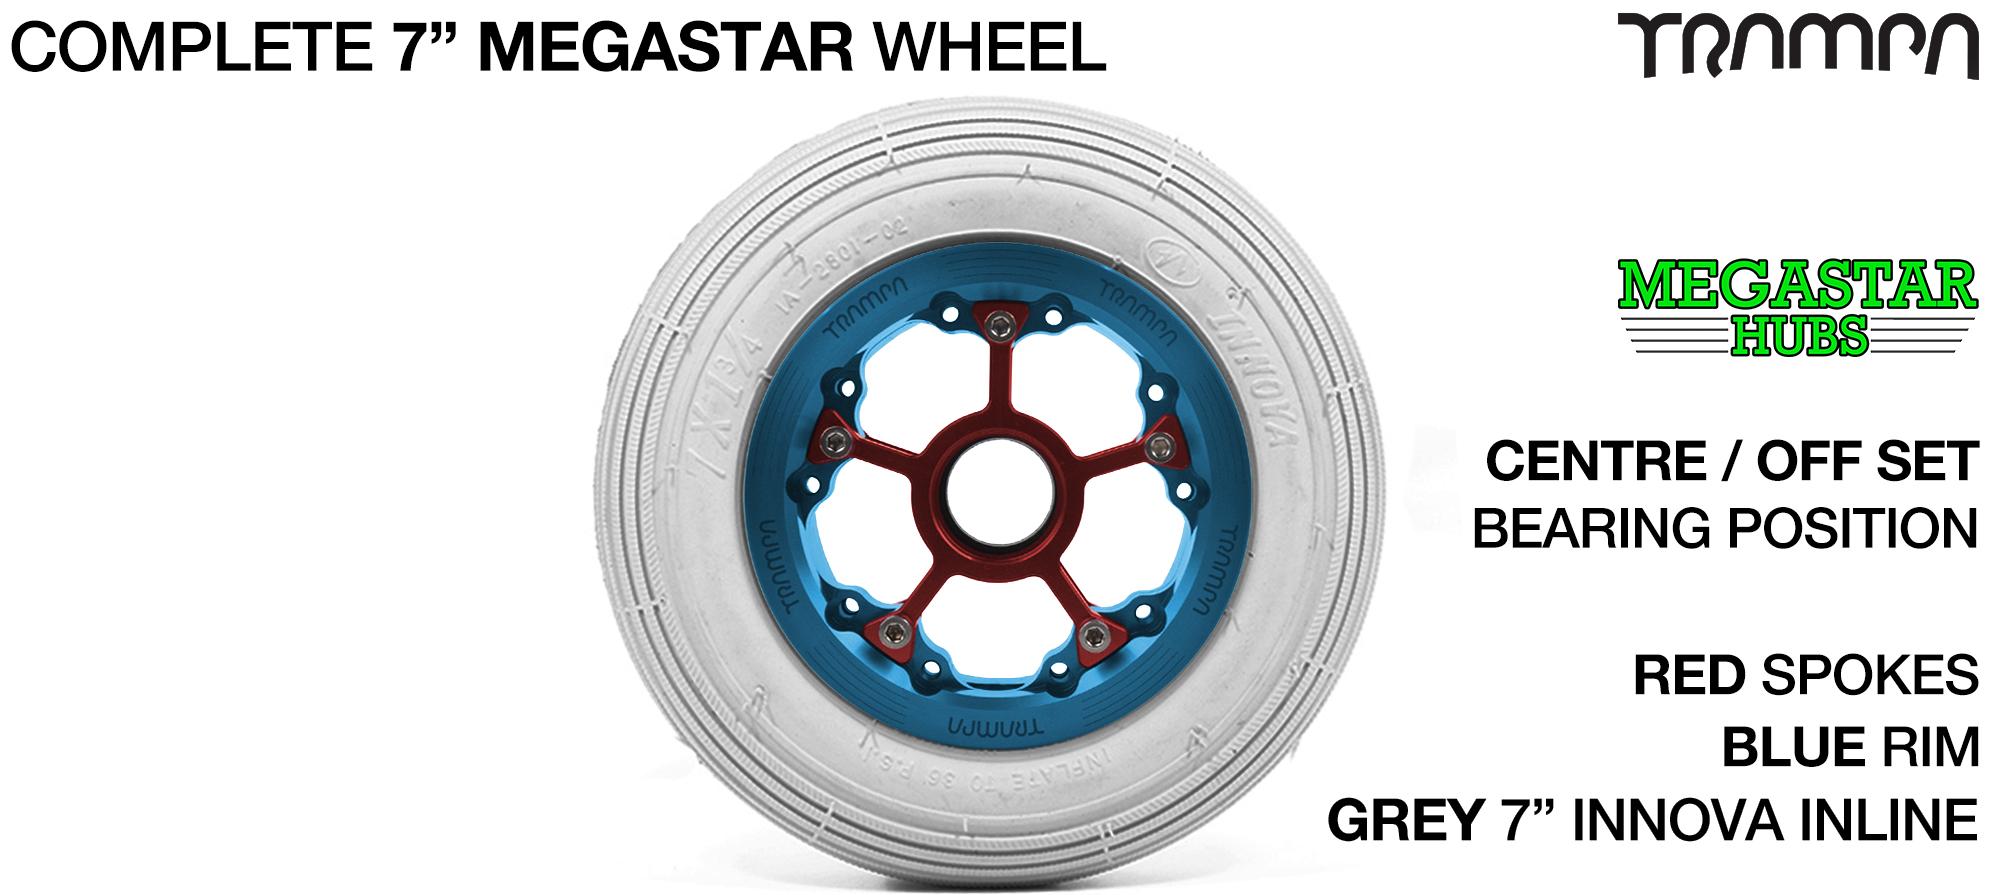 BLACK MEGASTAR Rims with GUNMETAL Spokes & 7 Inch Tyres